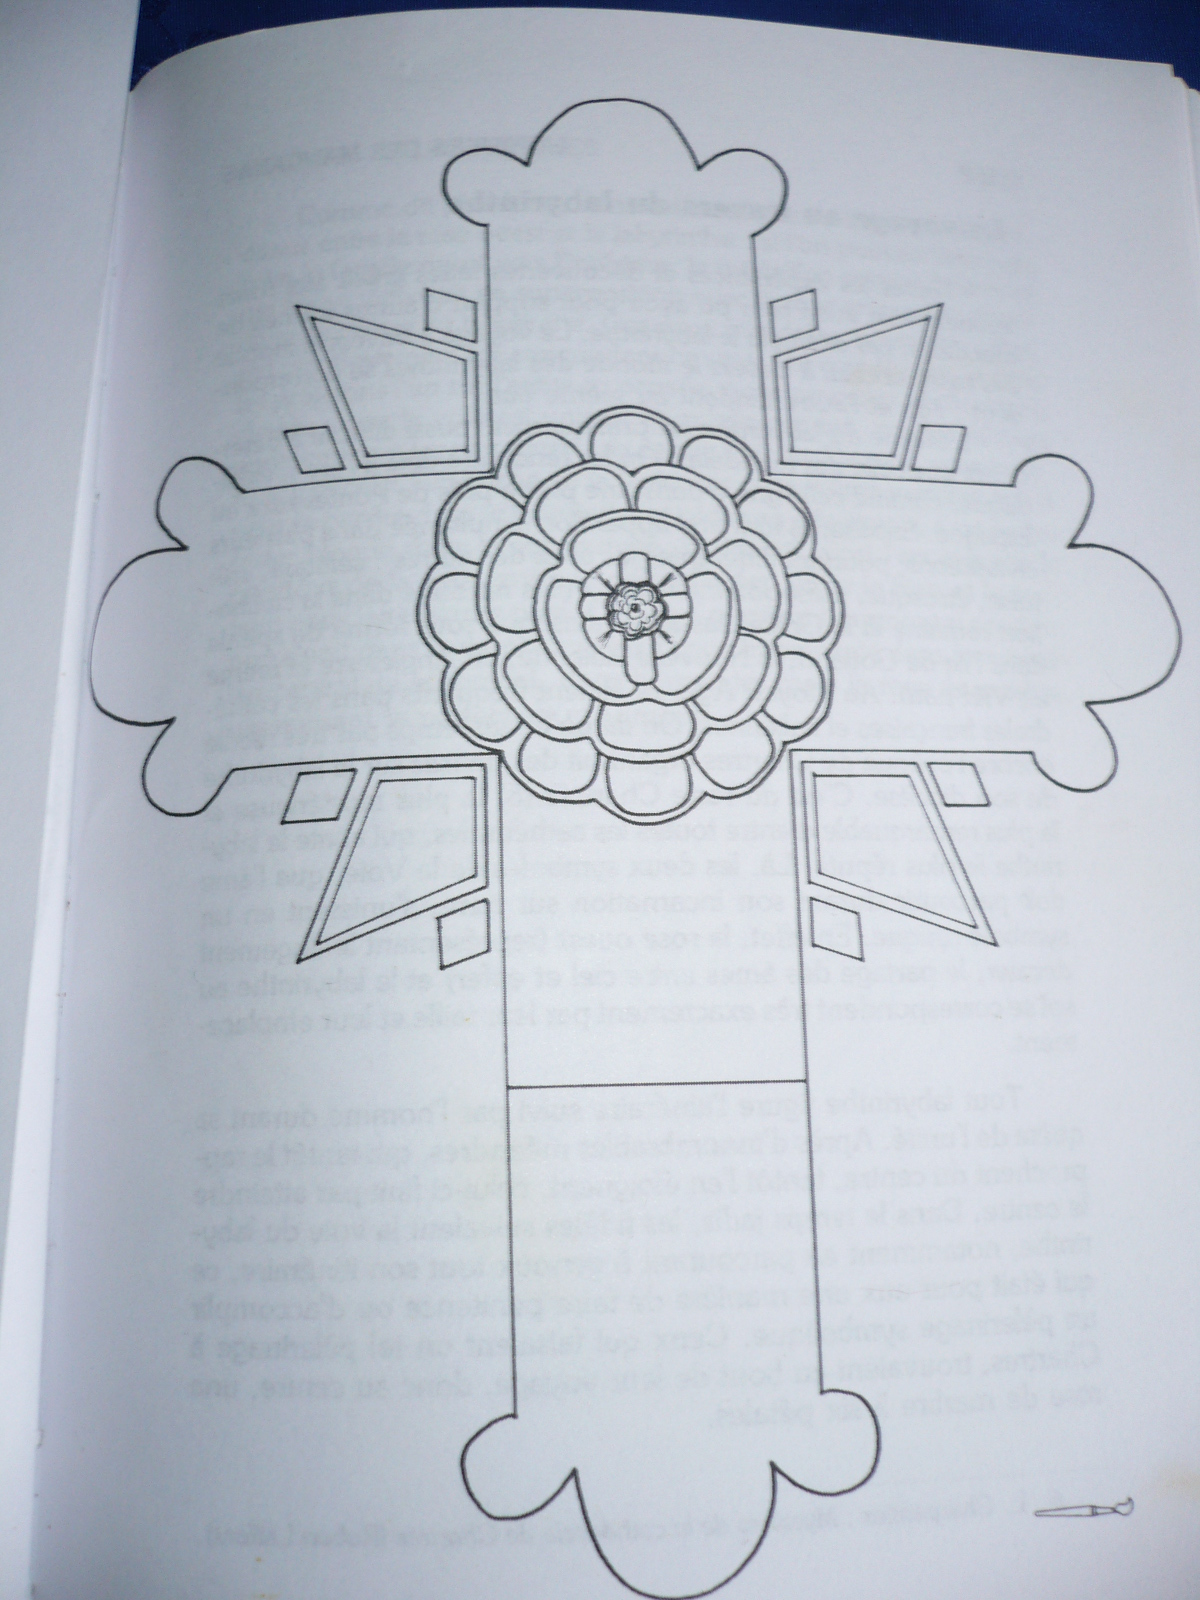 la-rose-croix-001.JPG